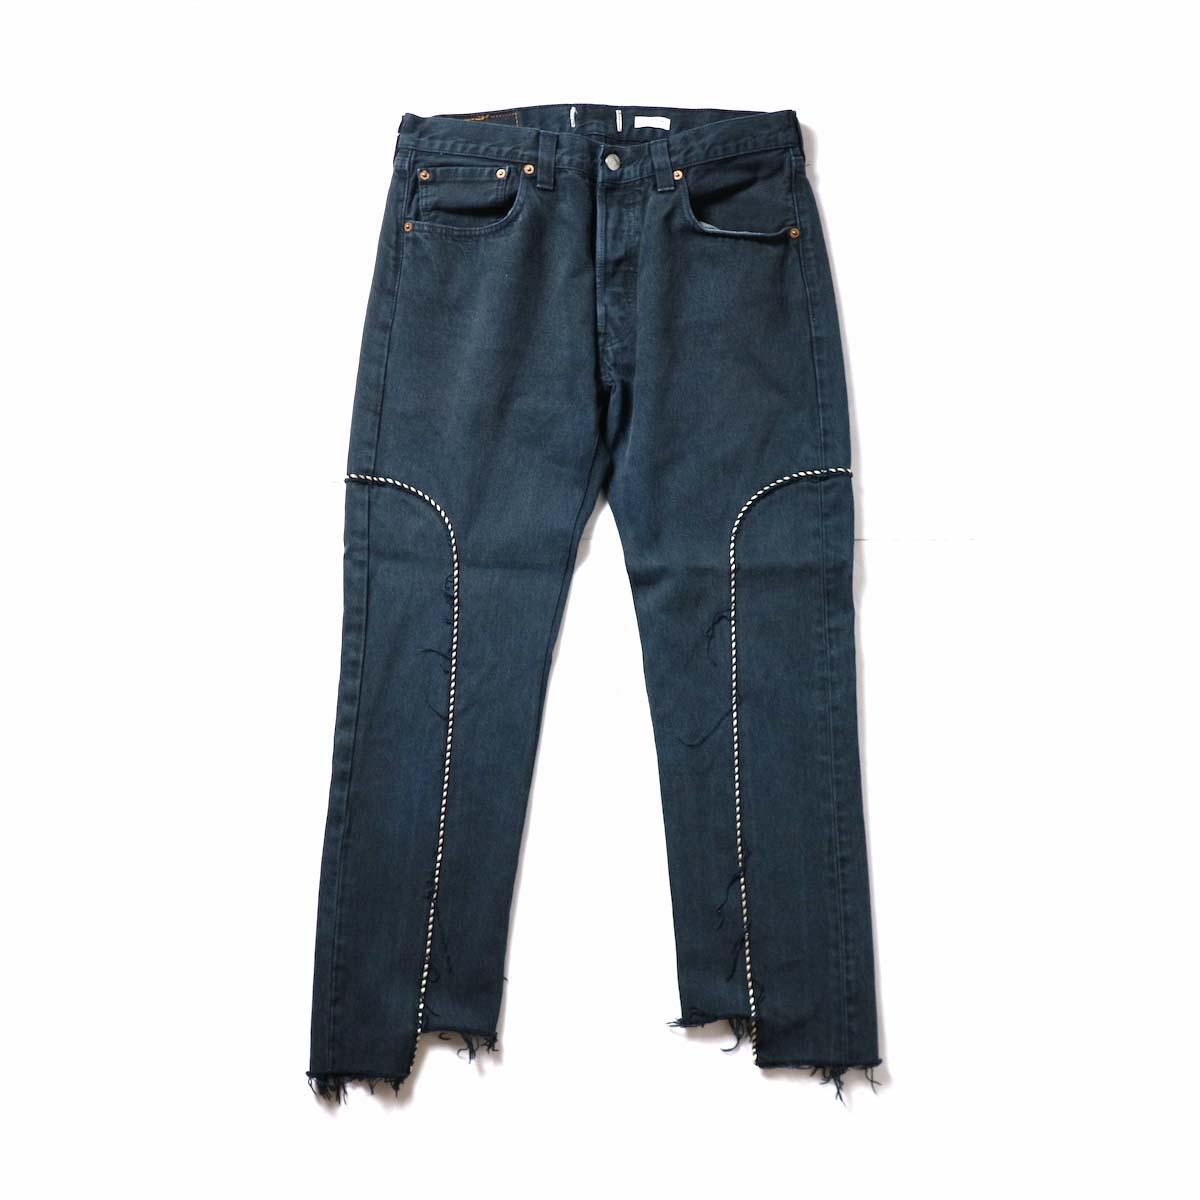 OLD PARK / Western Jeans Black (Msize-D)